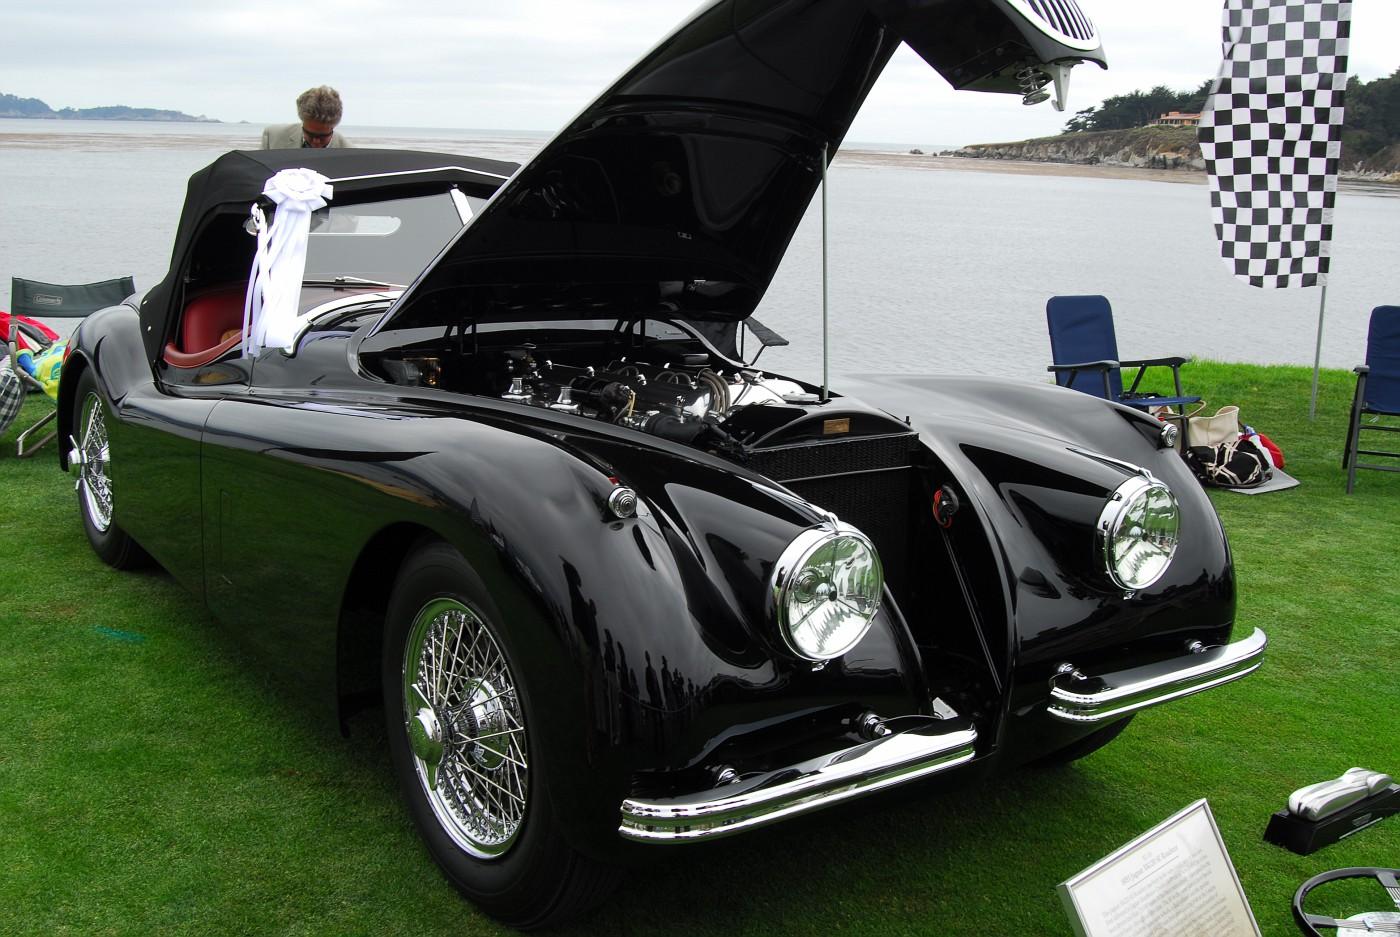 1953 Jaguar XK120 Roadster front exterior view